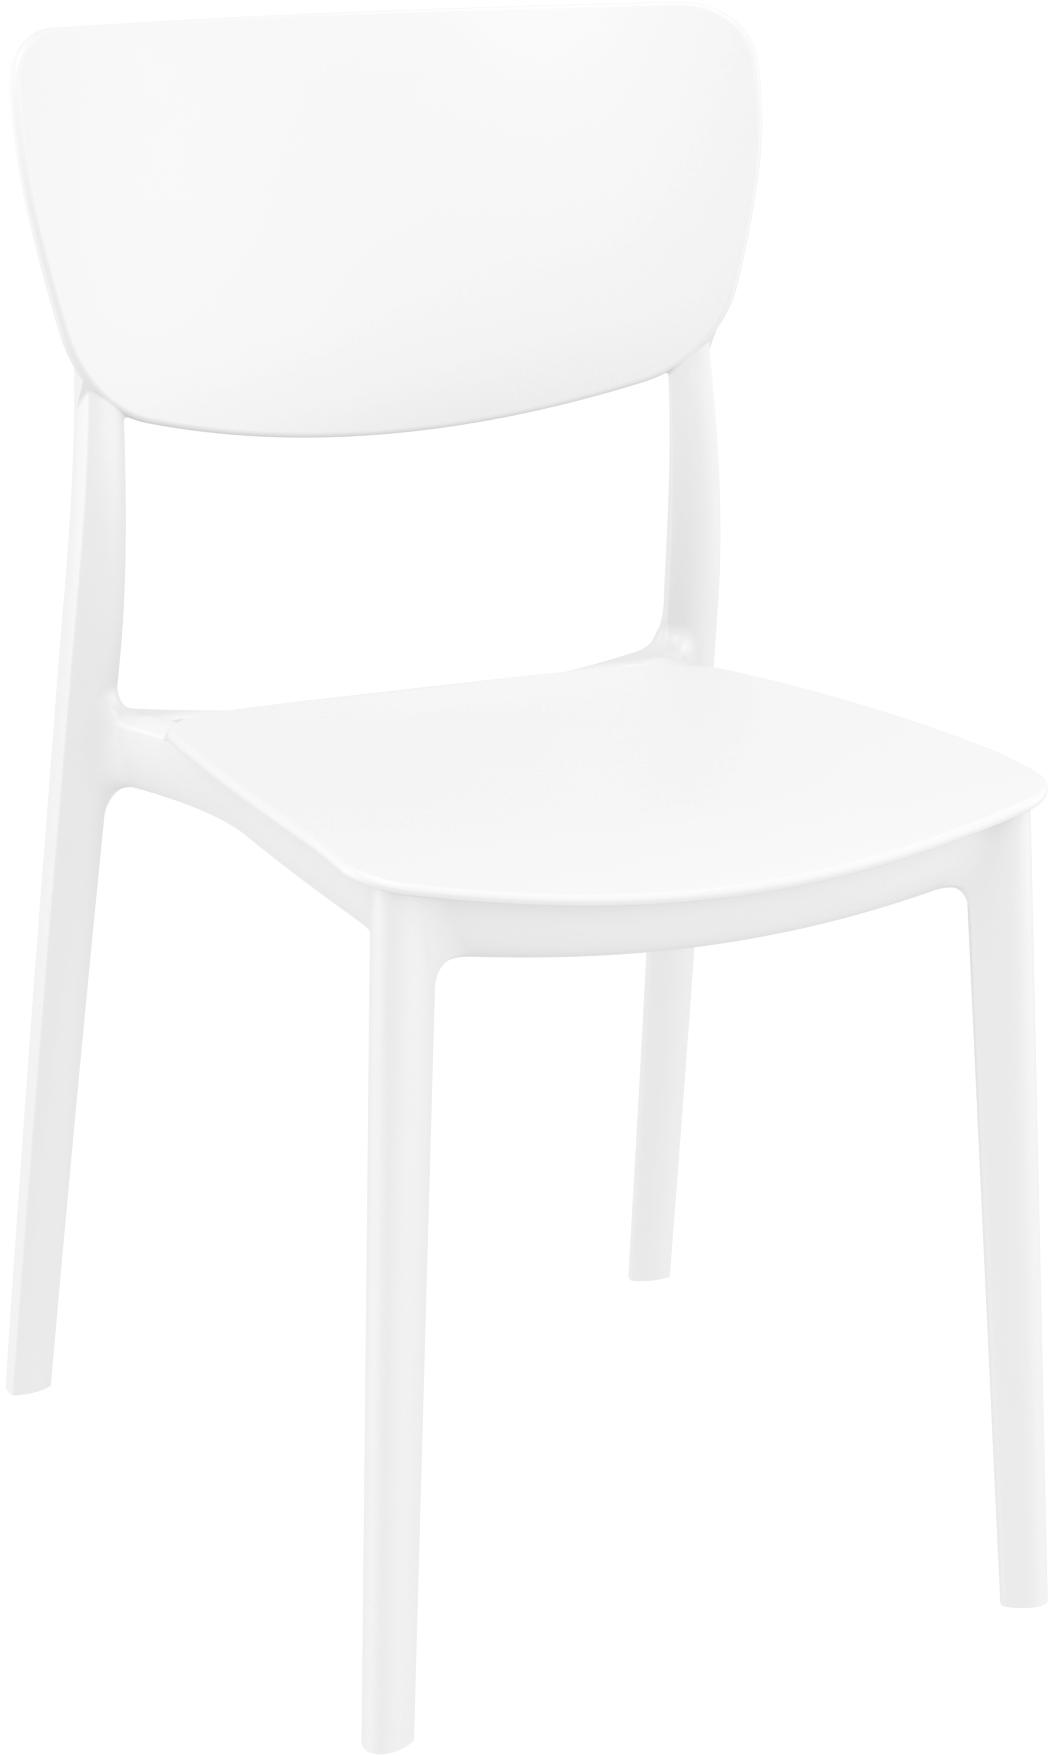 029-monna-white-front-side.jpg